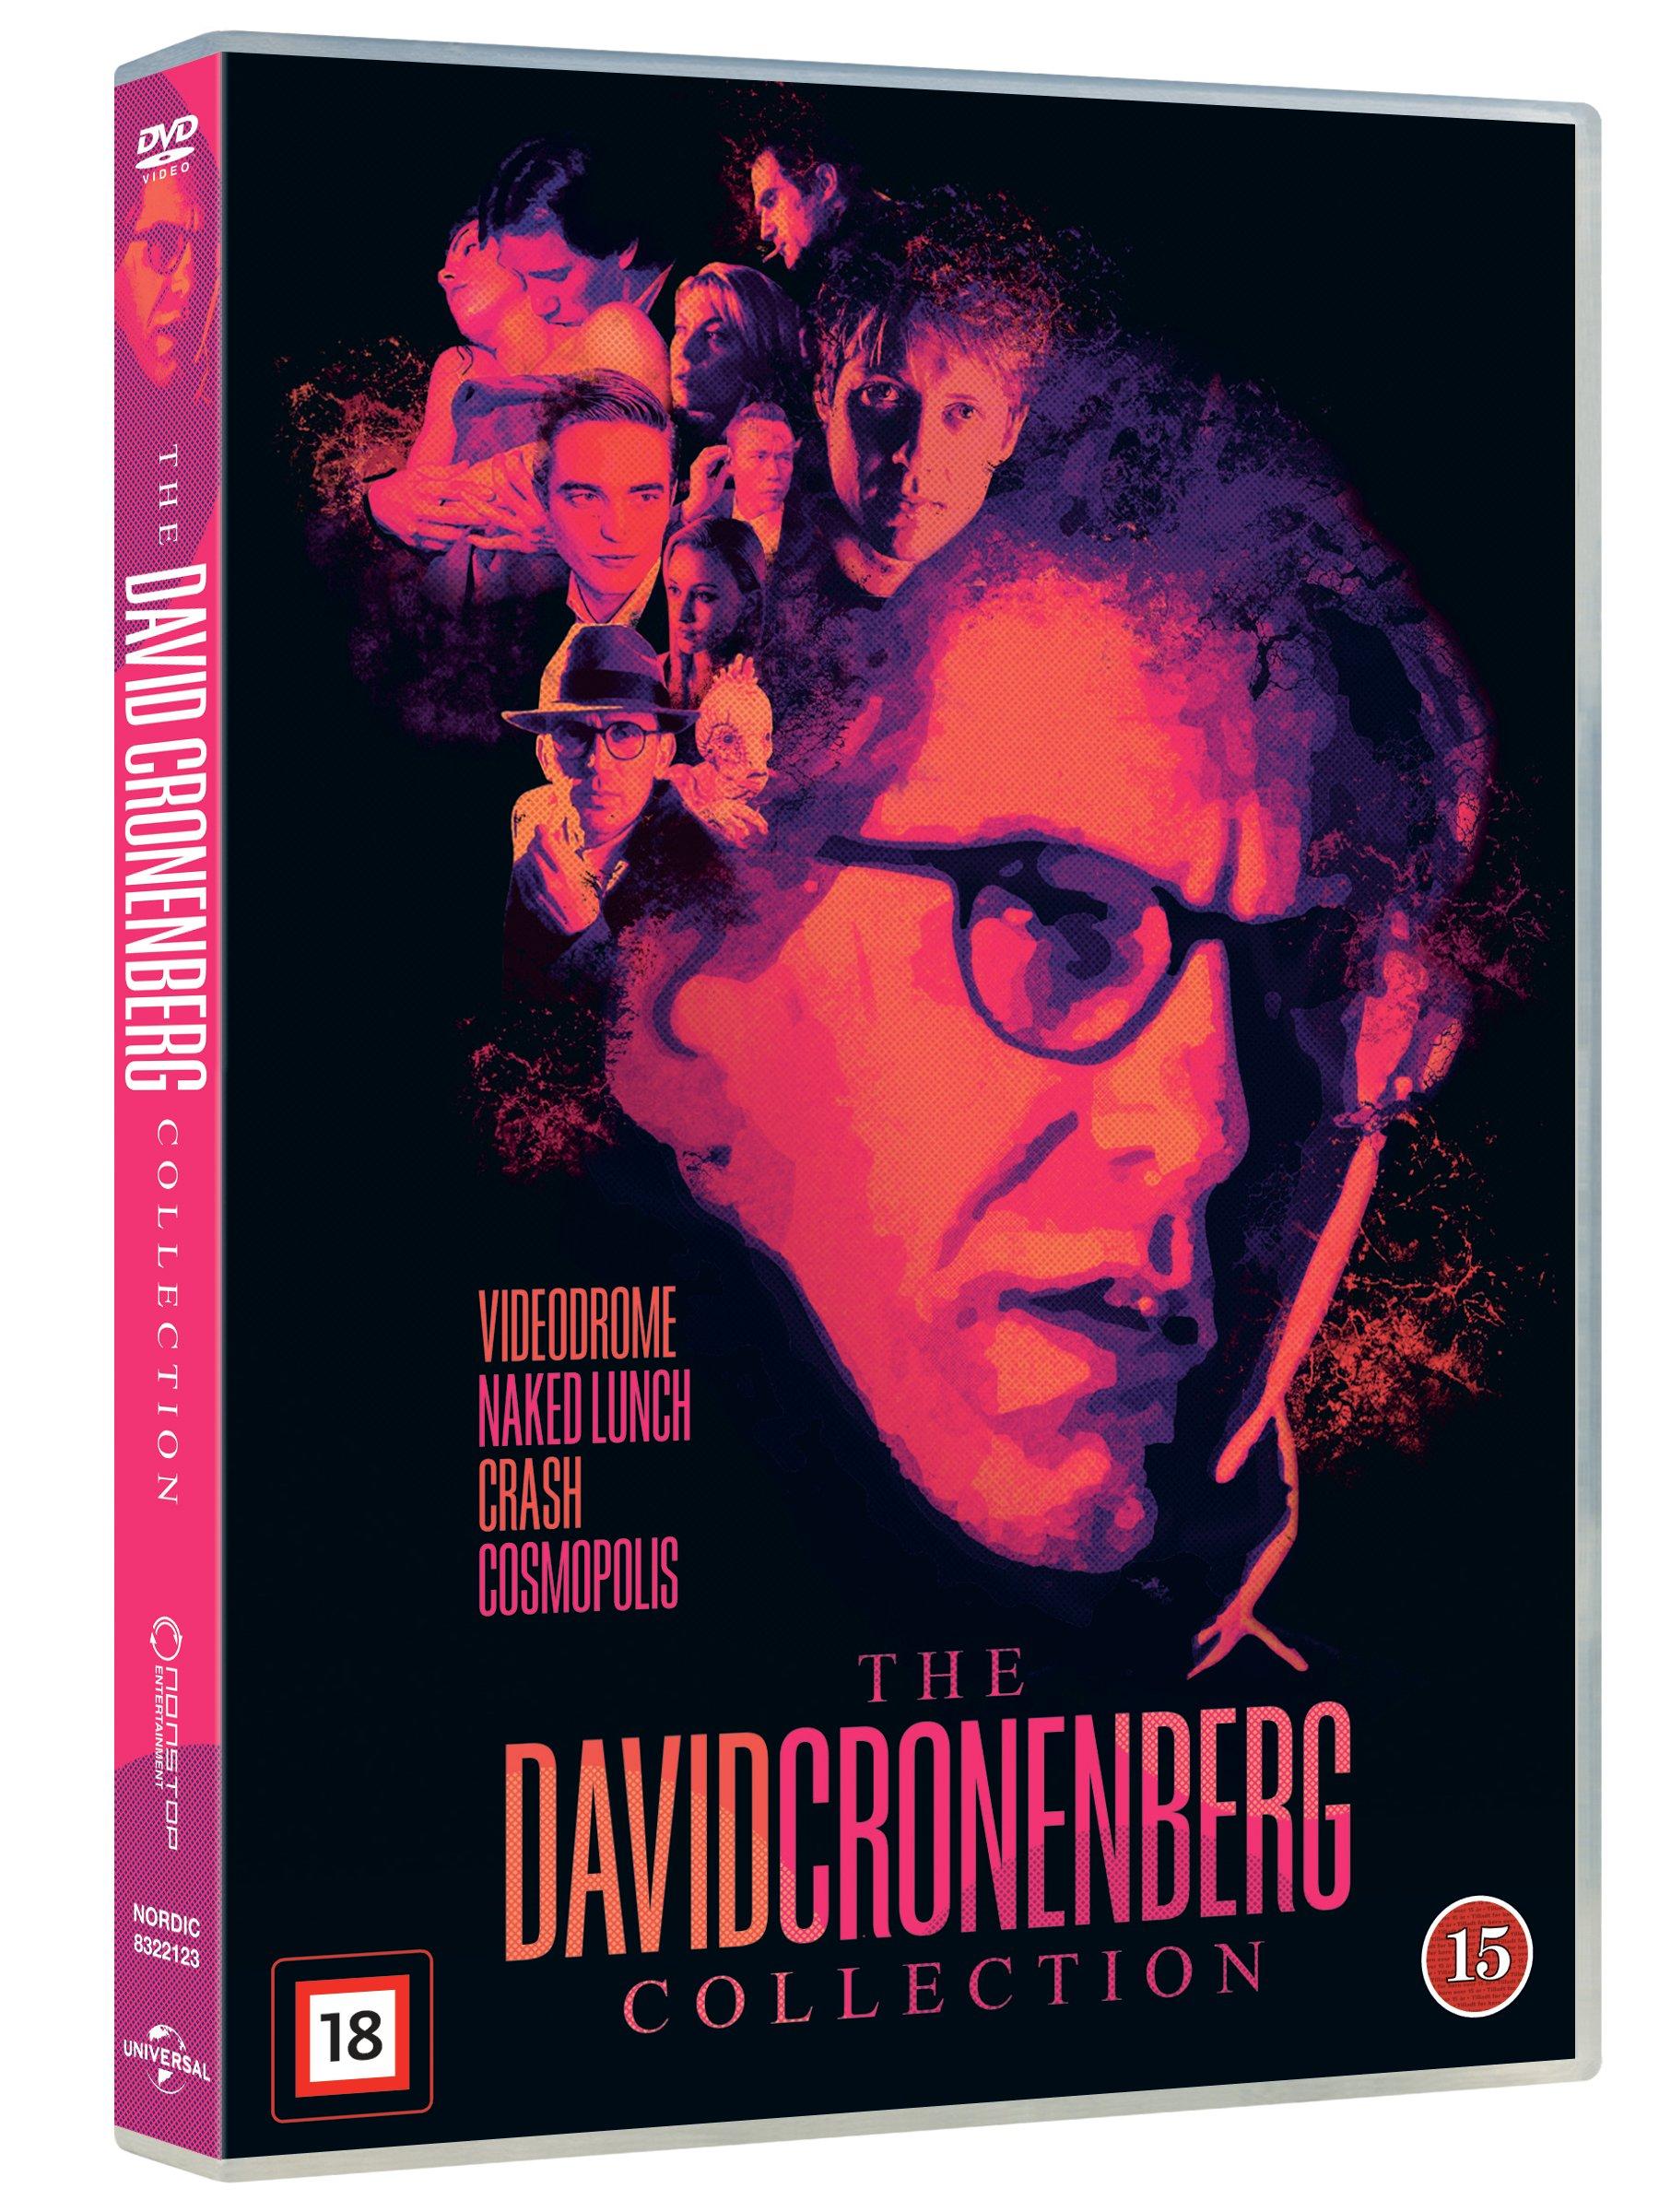 David Cronenberg Collection - DVD